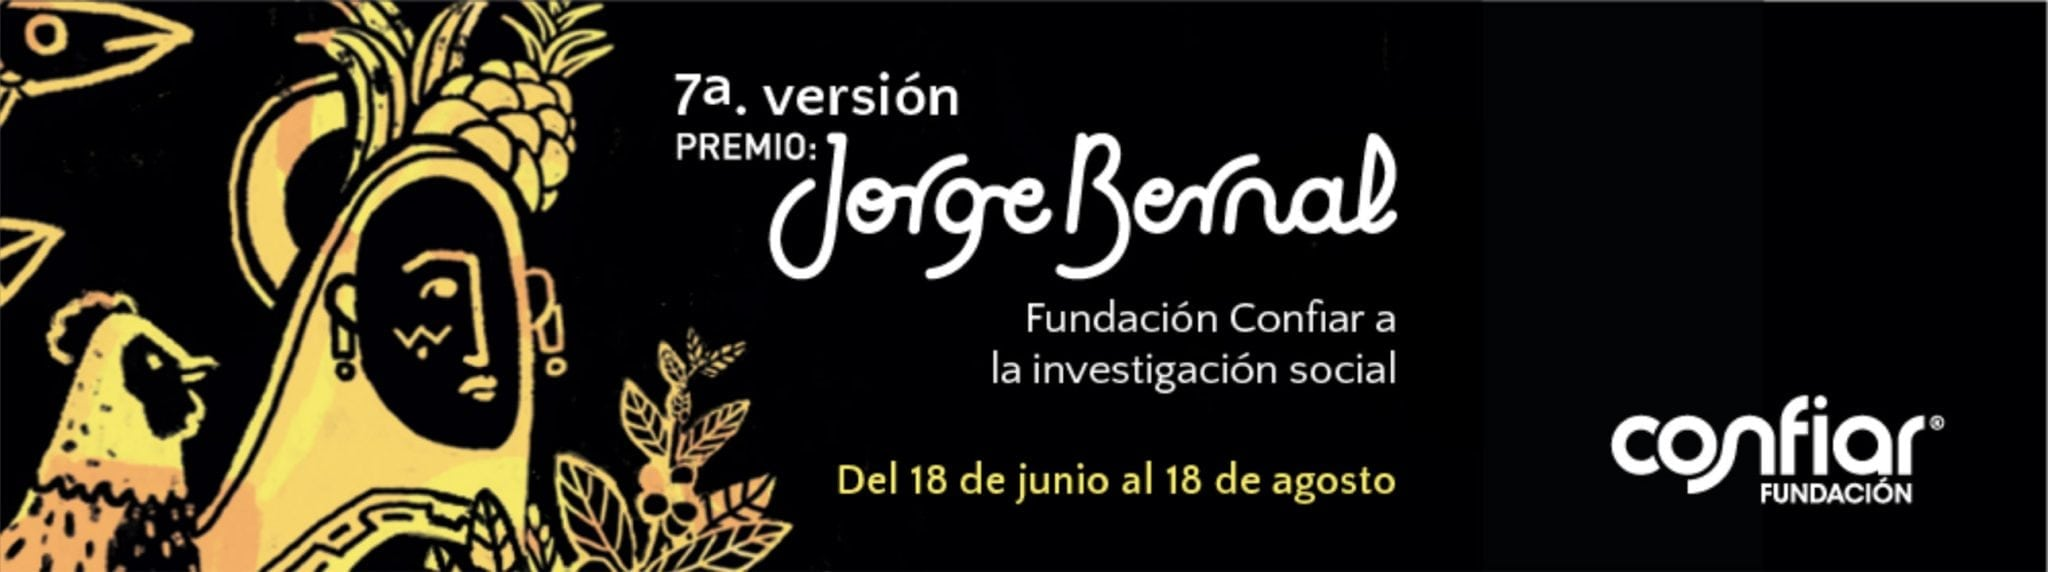 Séptima convocatoria del Premio Jorge Bernal